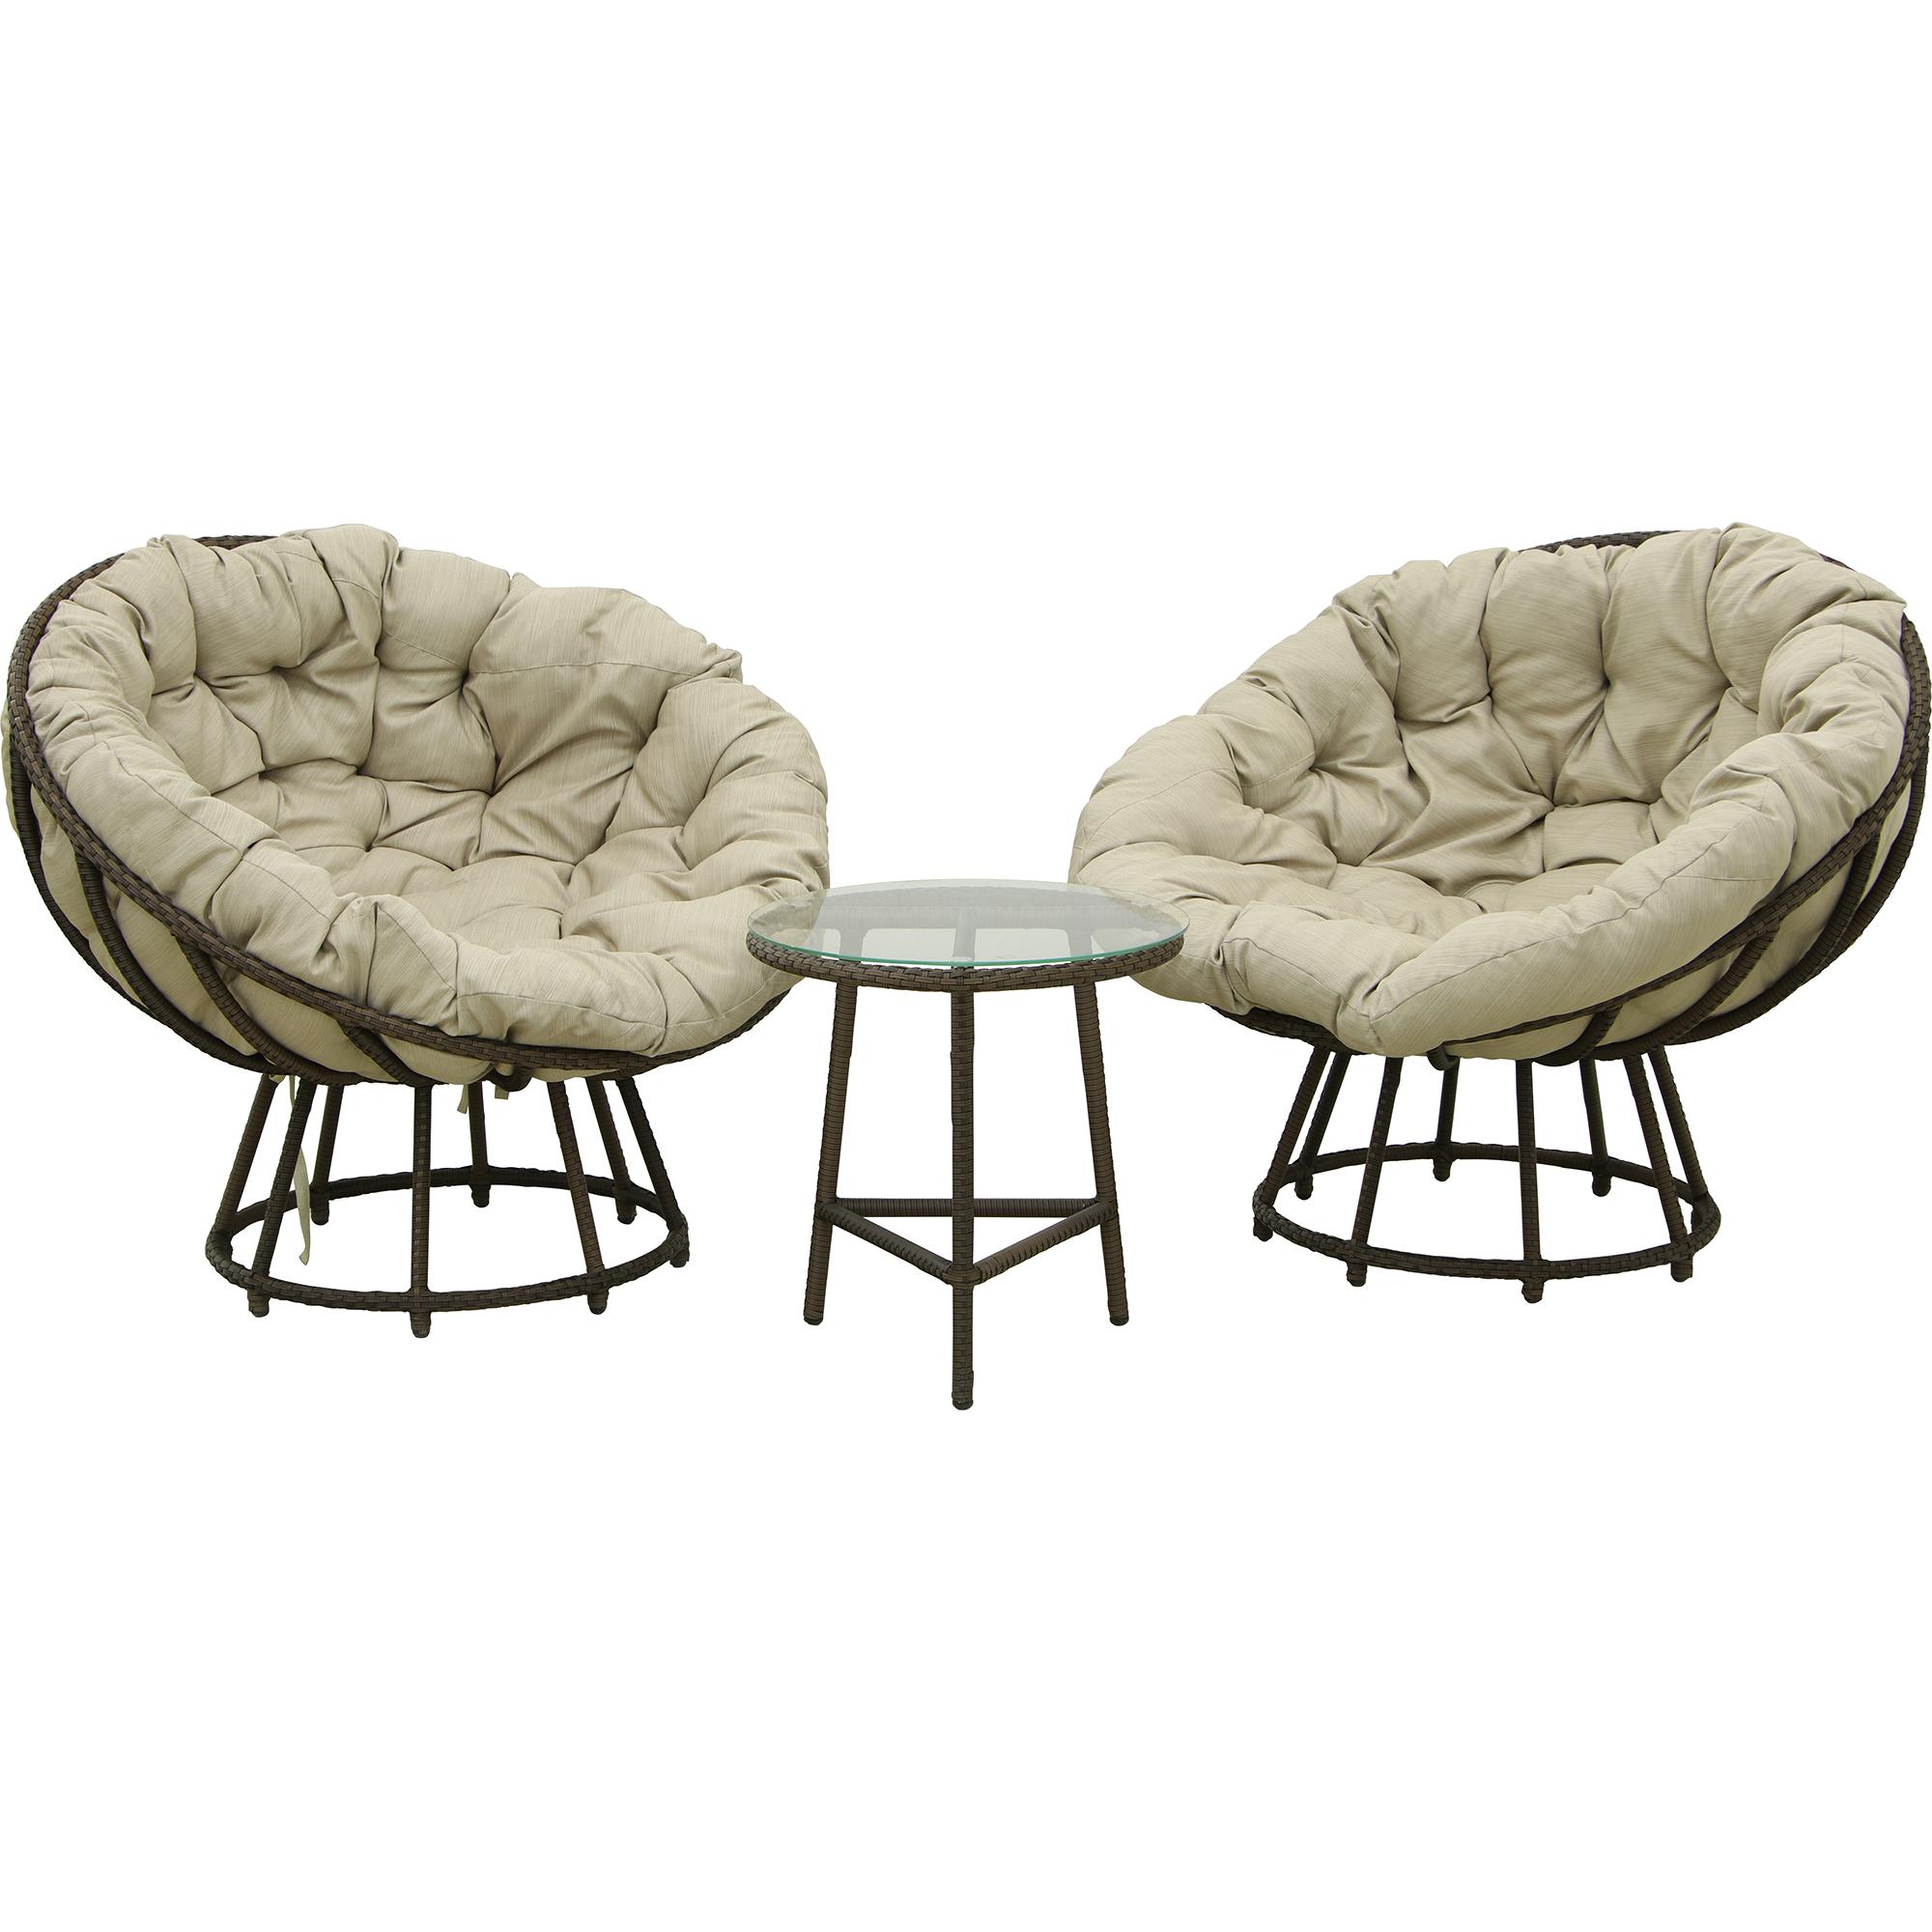 Фото - Комплект мебели Mavi rattan 3 предмета рубашка mavi 021235 620